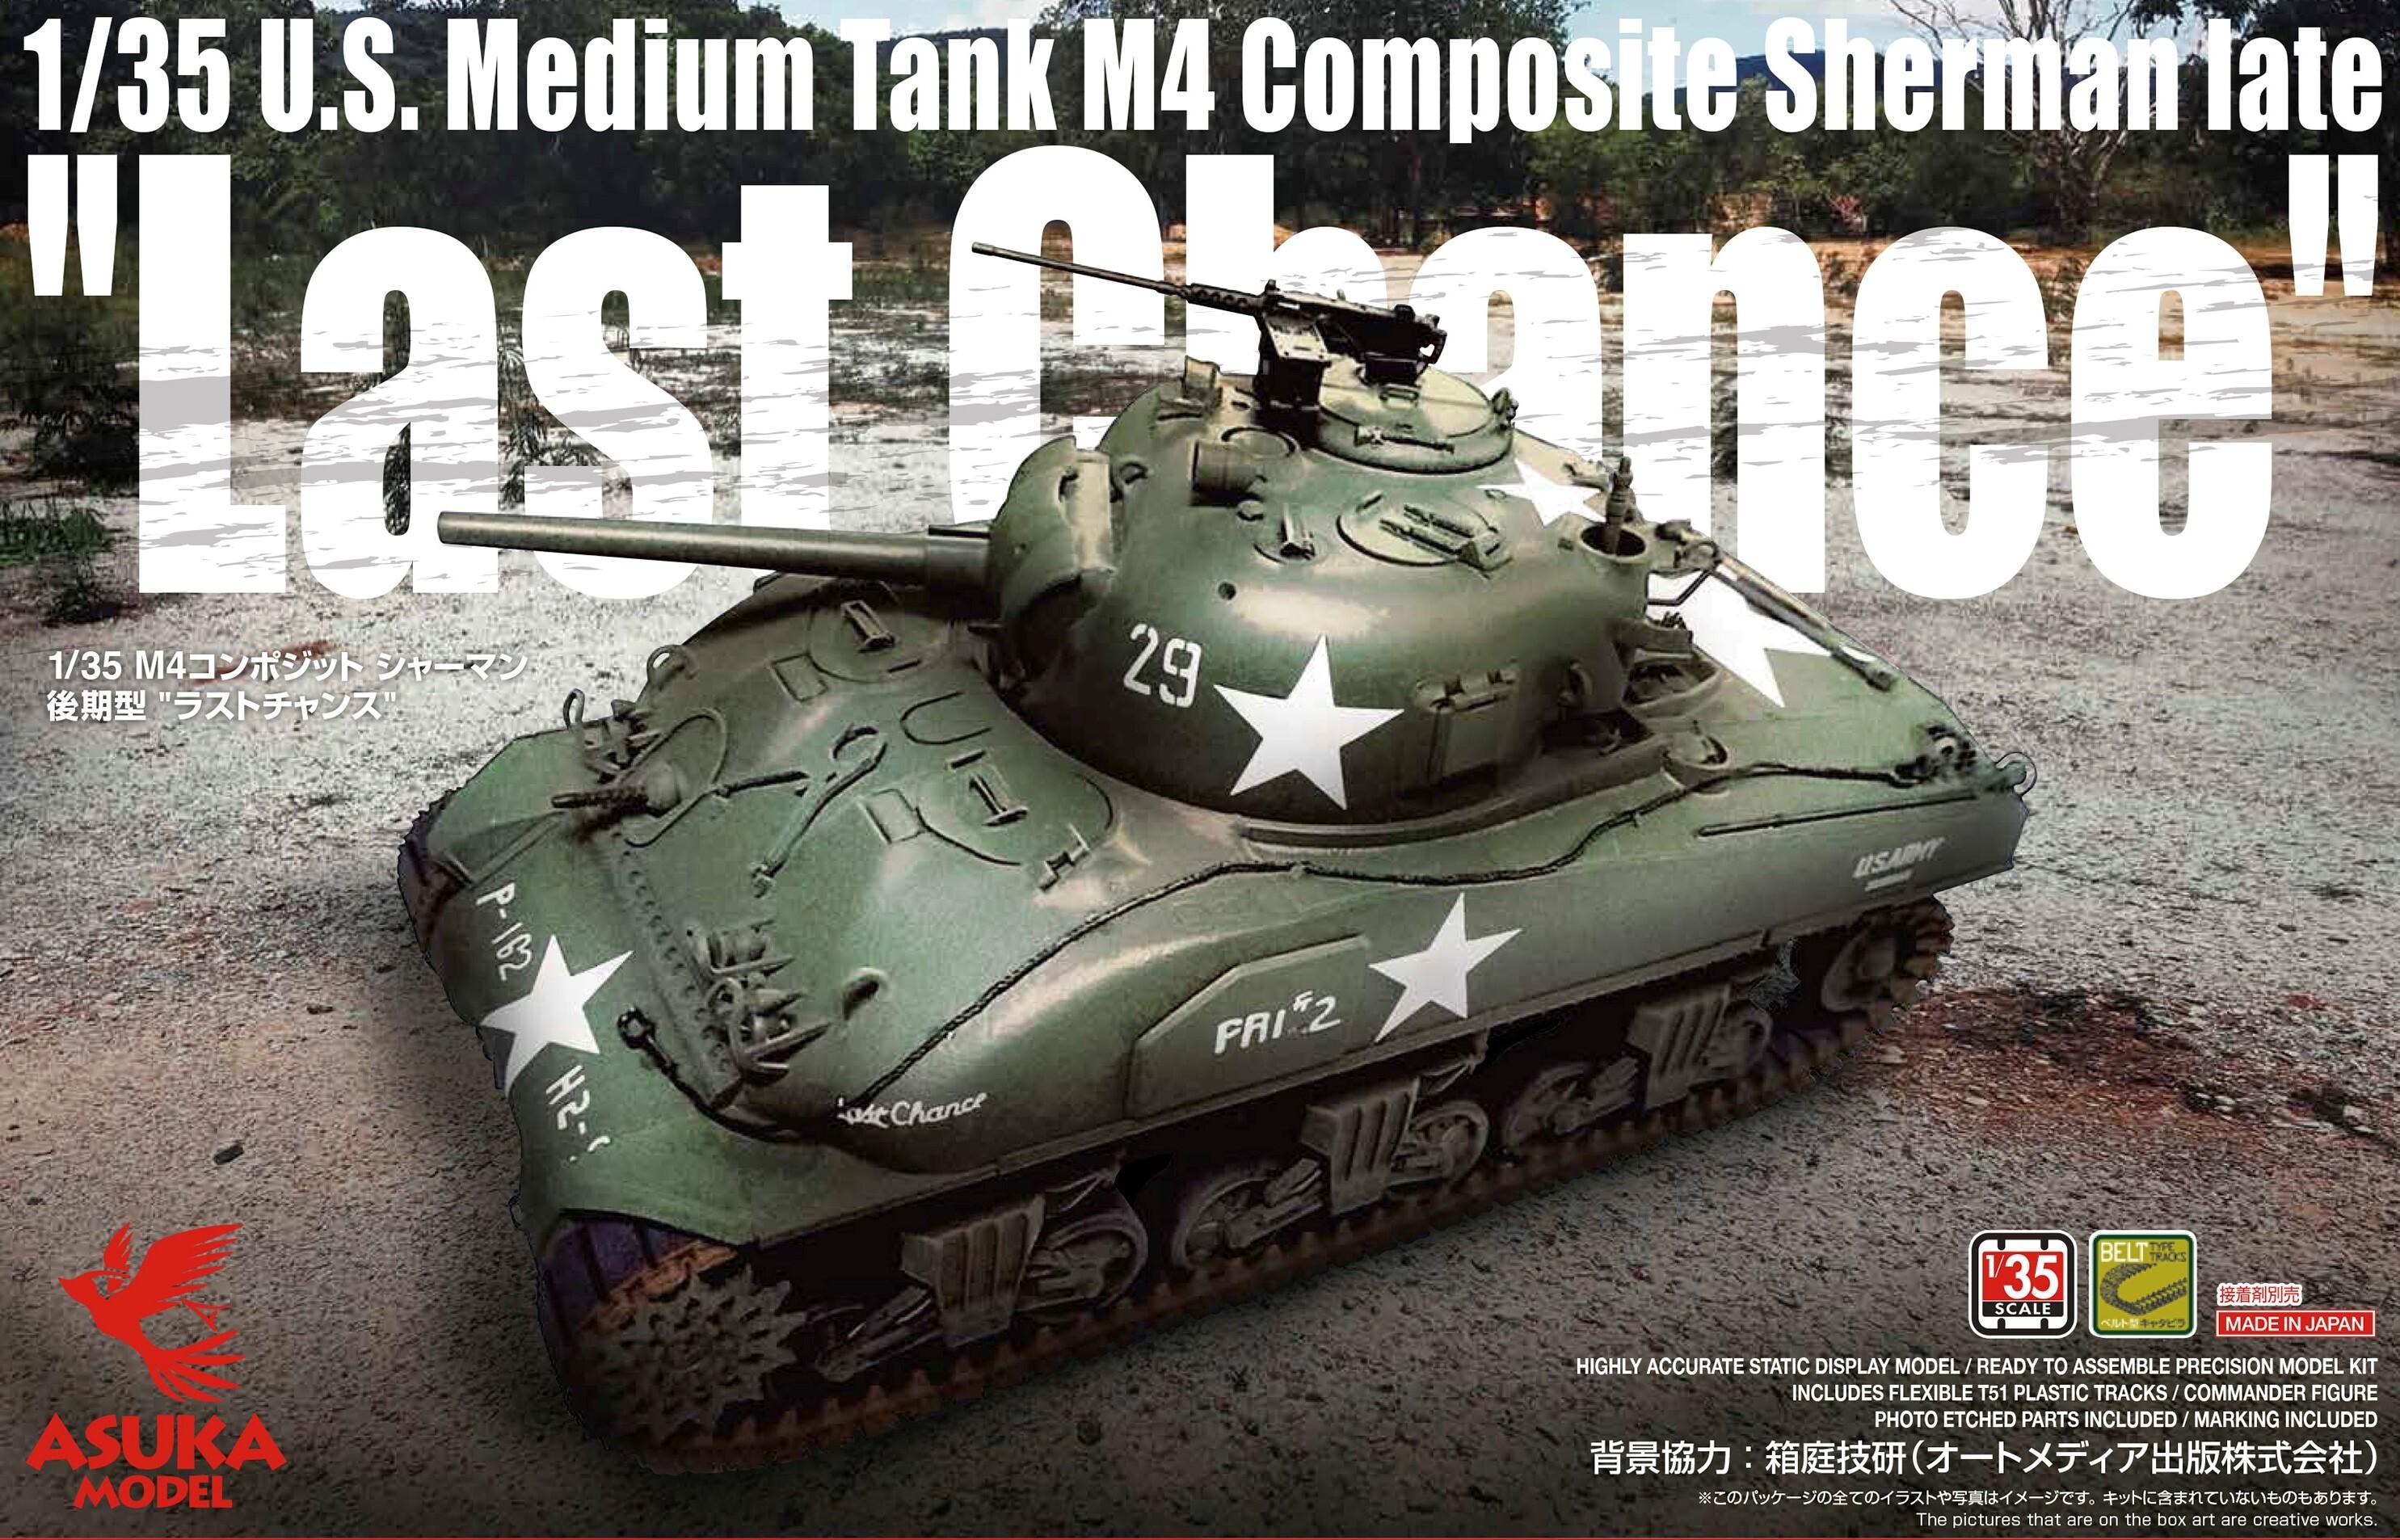 "Asuka 1/35 U.S. Medium Tank M4 Composite Sherman late ""Last Chance"""